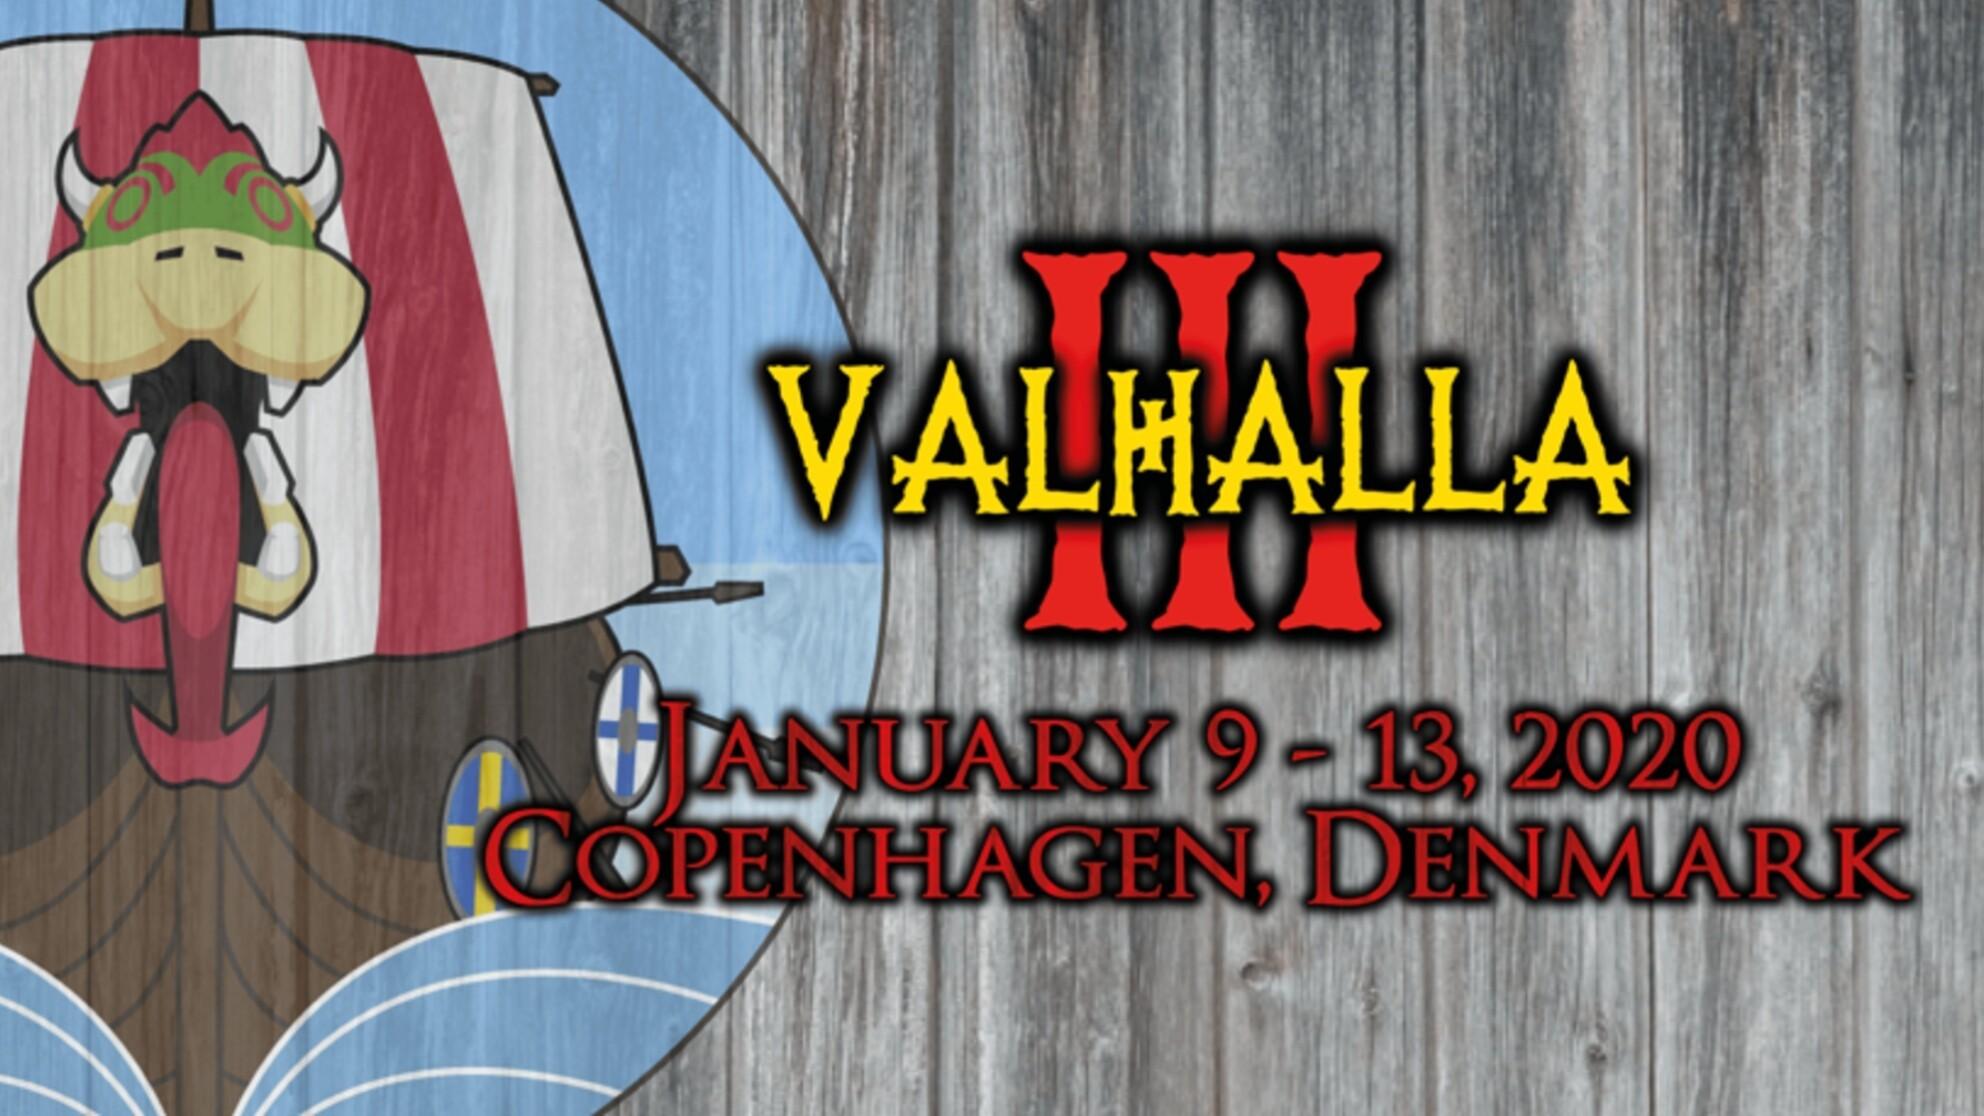 Valhalla III results